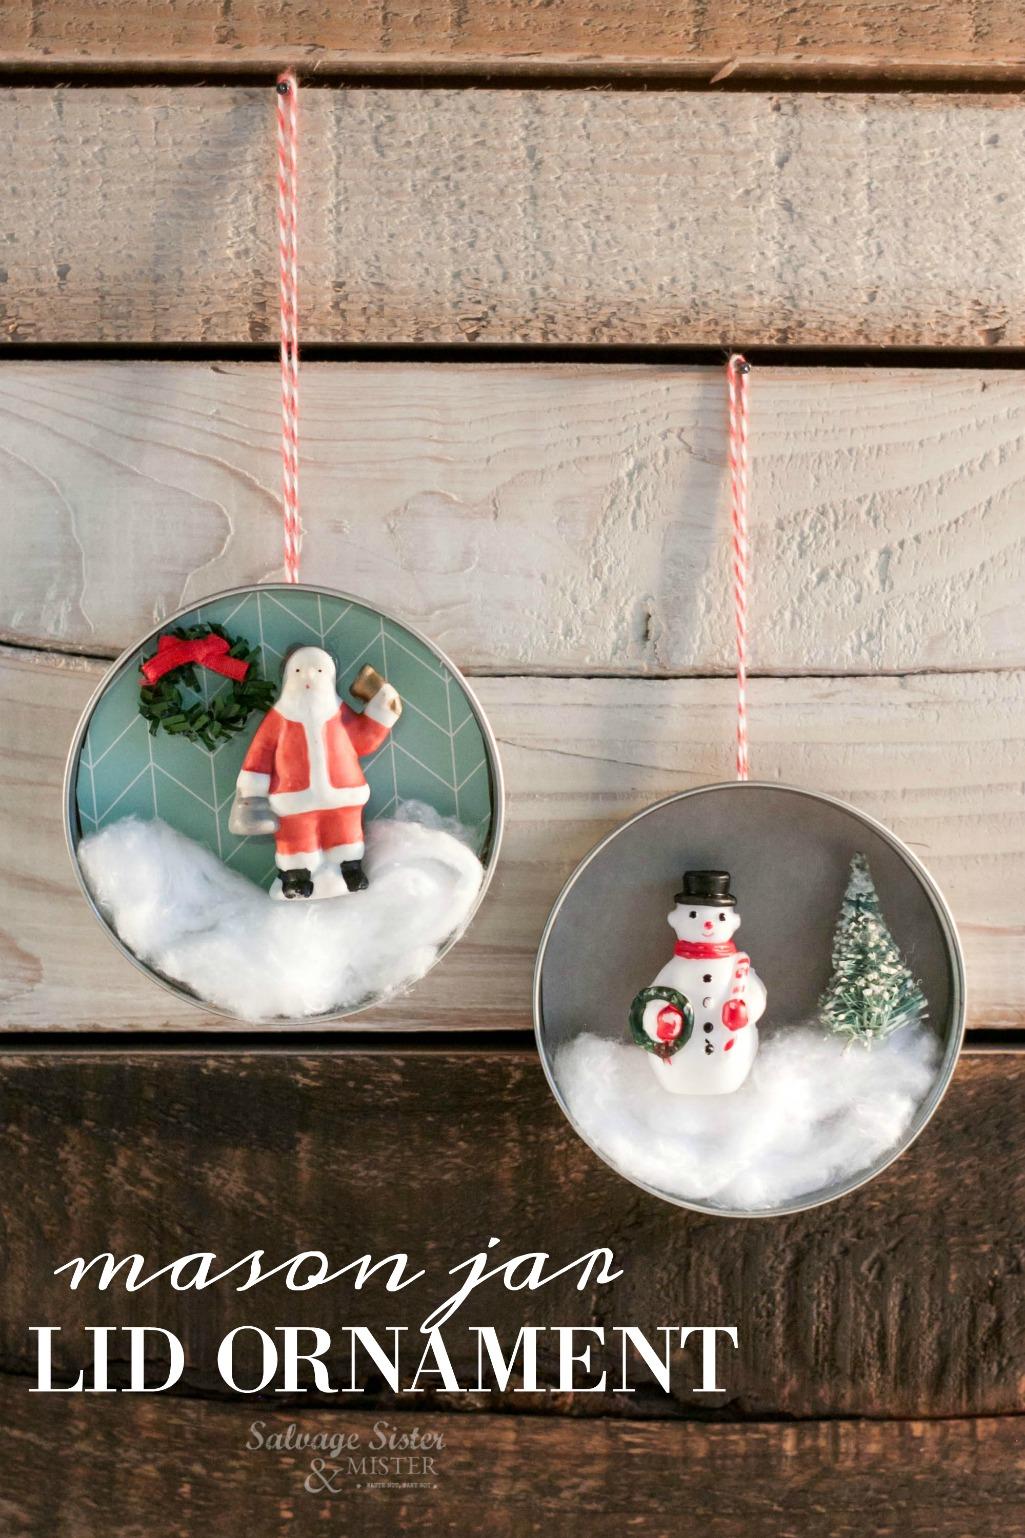 Mason Jar Lid Ornament Craft Salvage Sister And Mister